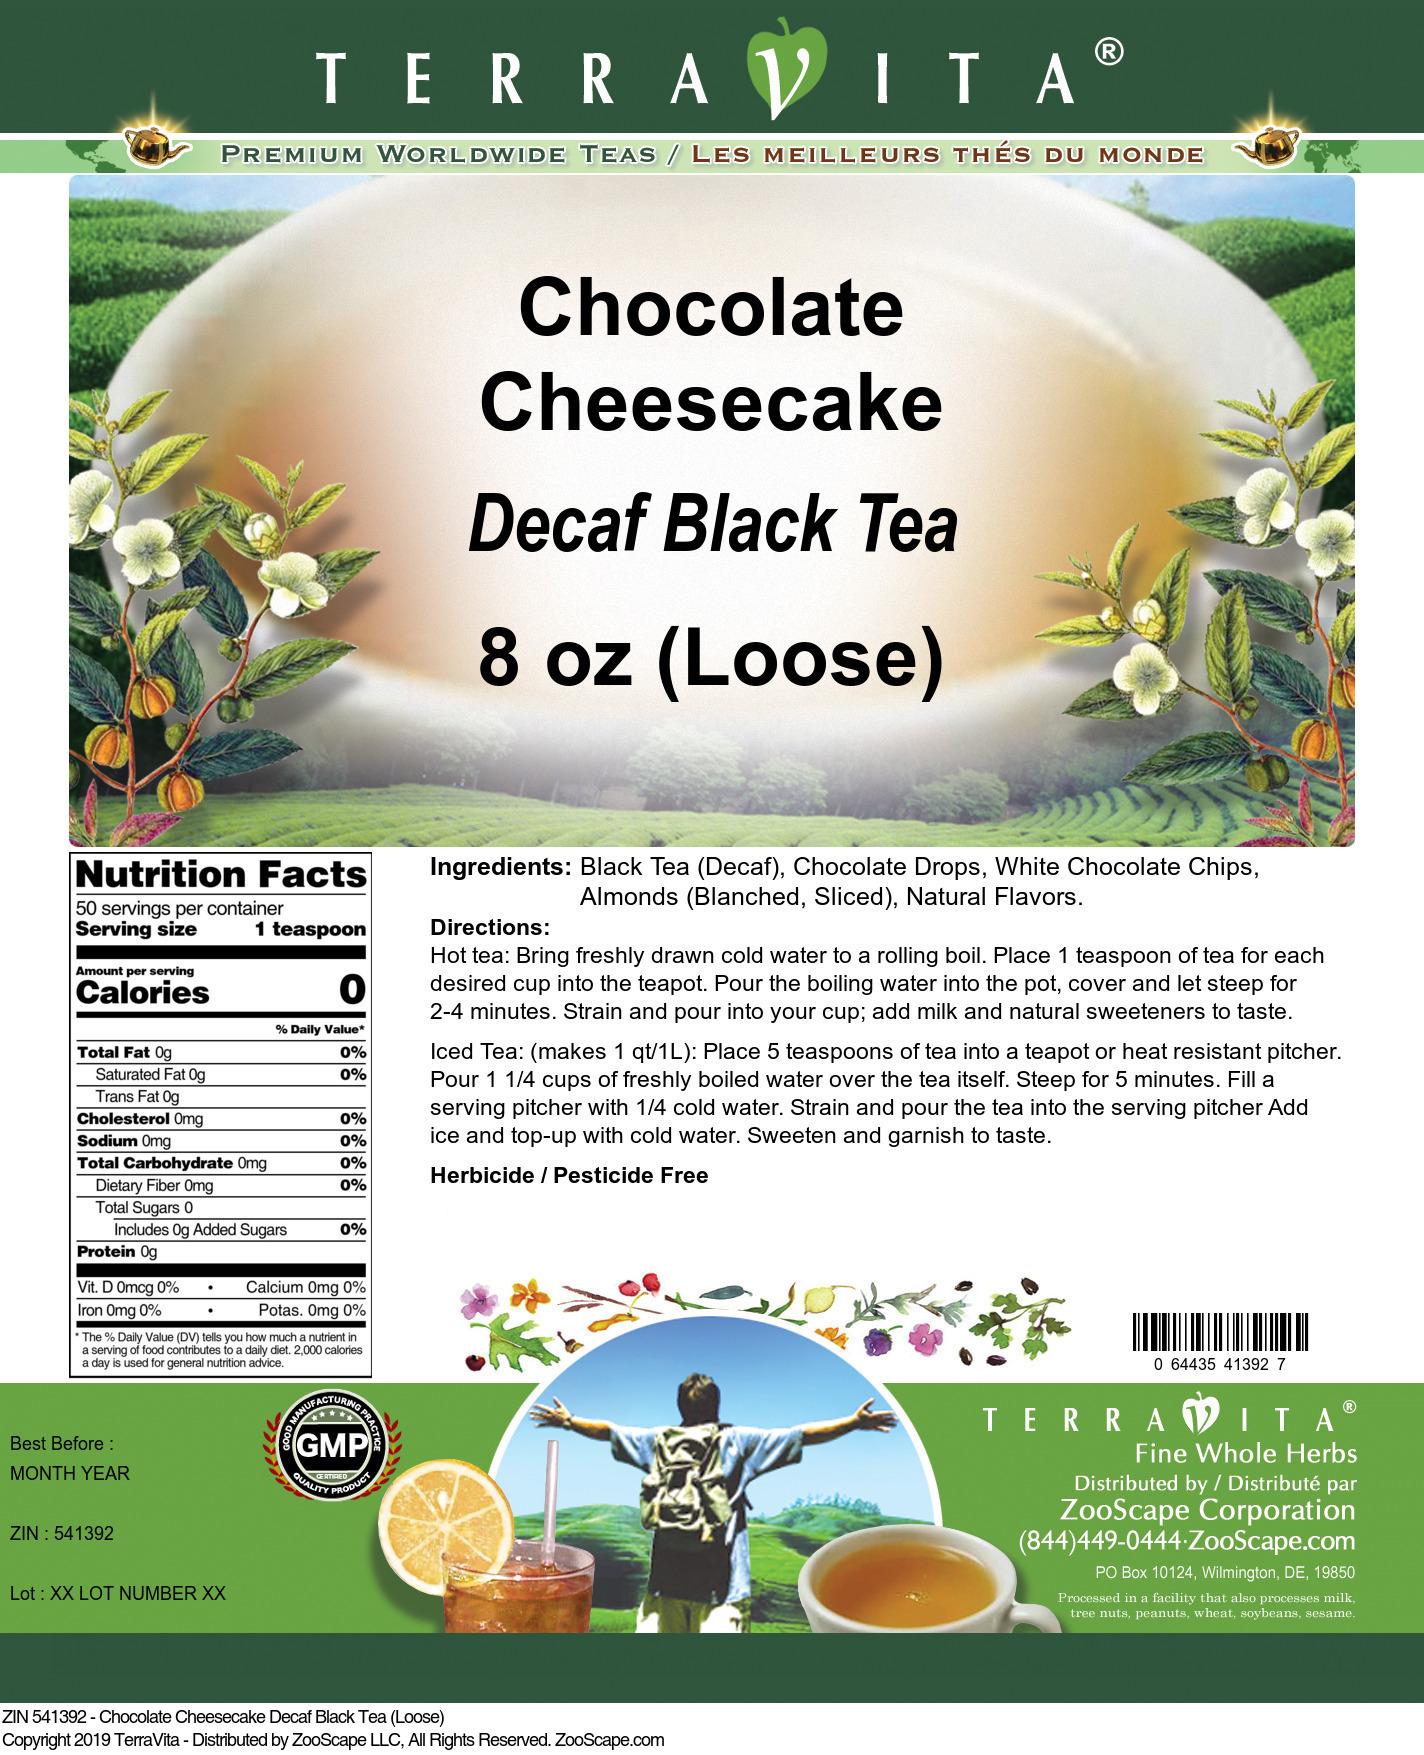 Chocolate Cheesecake Decaf Black Tea (Loose)